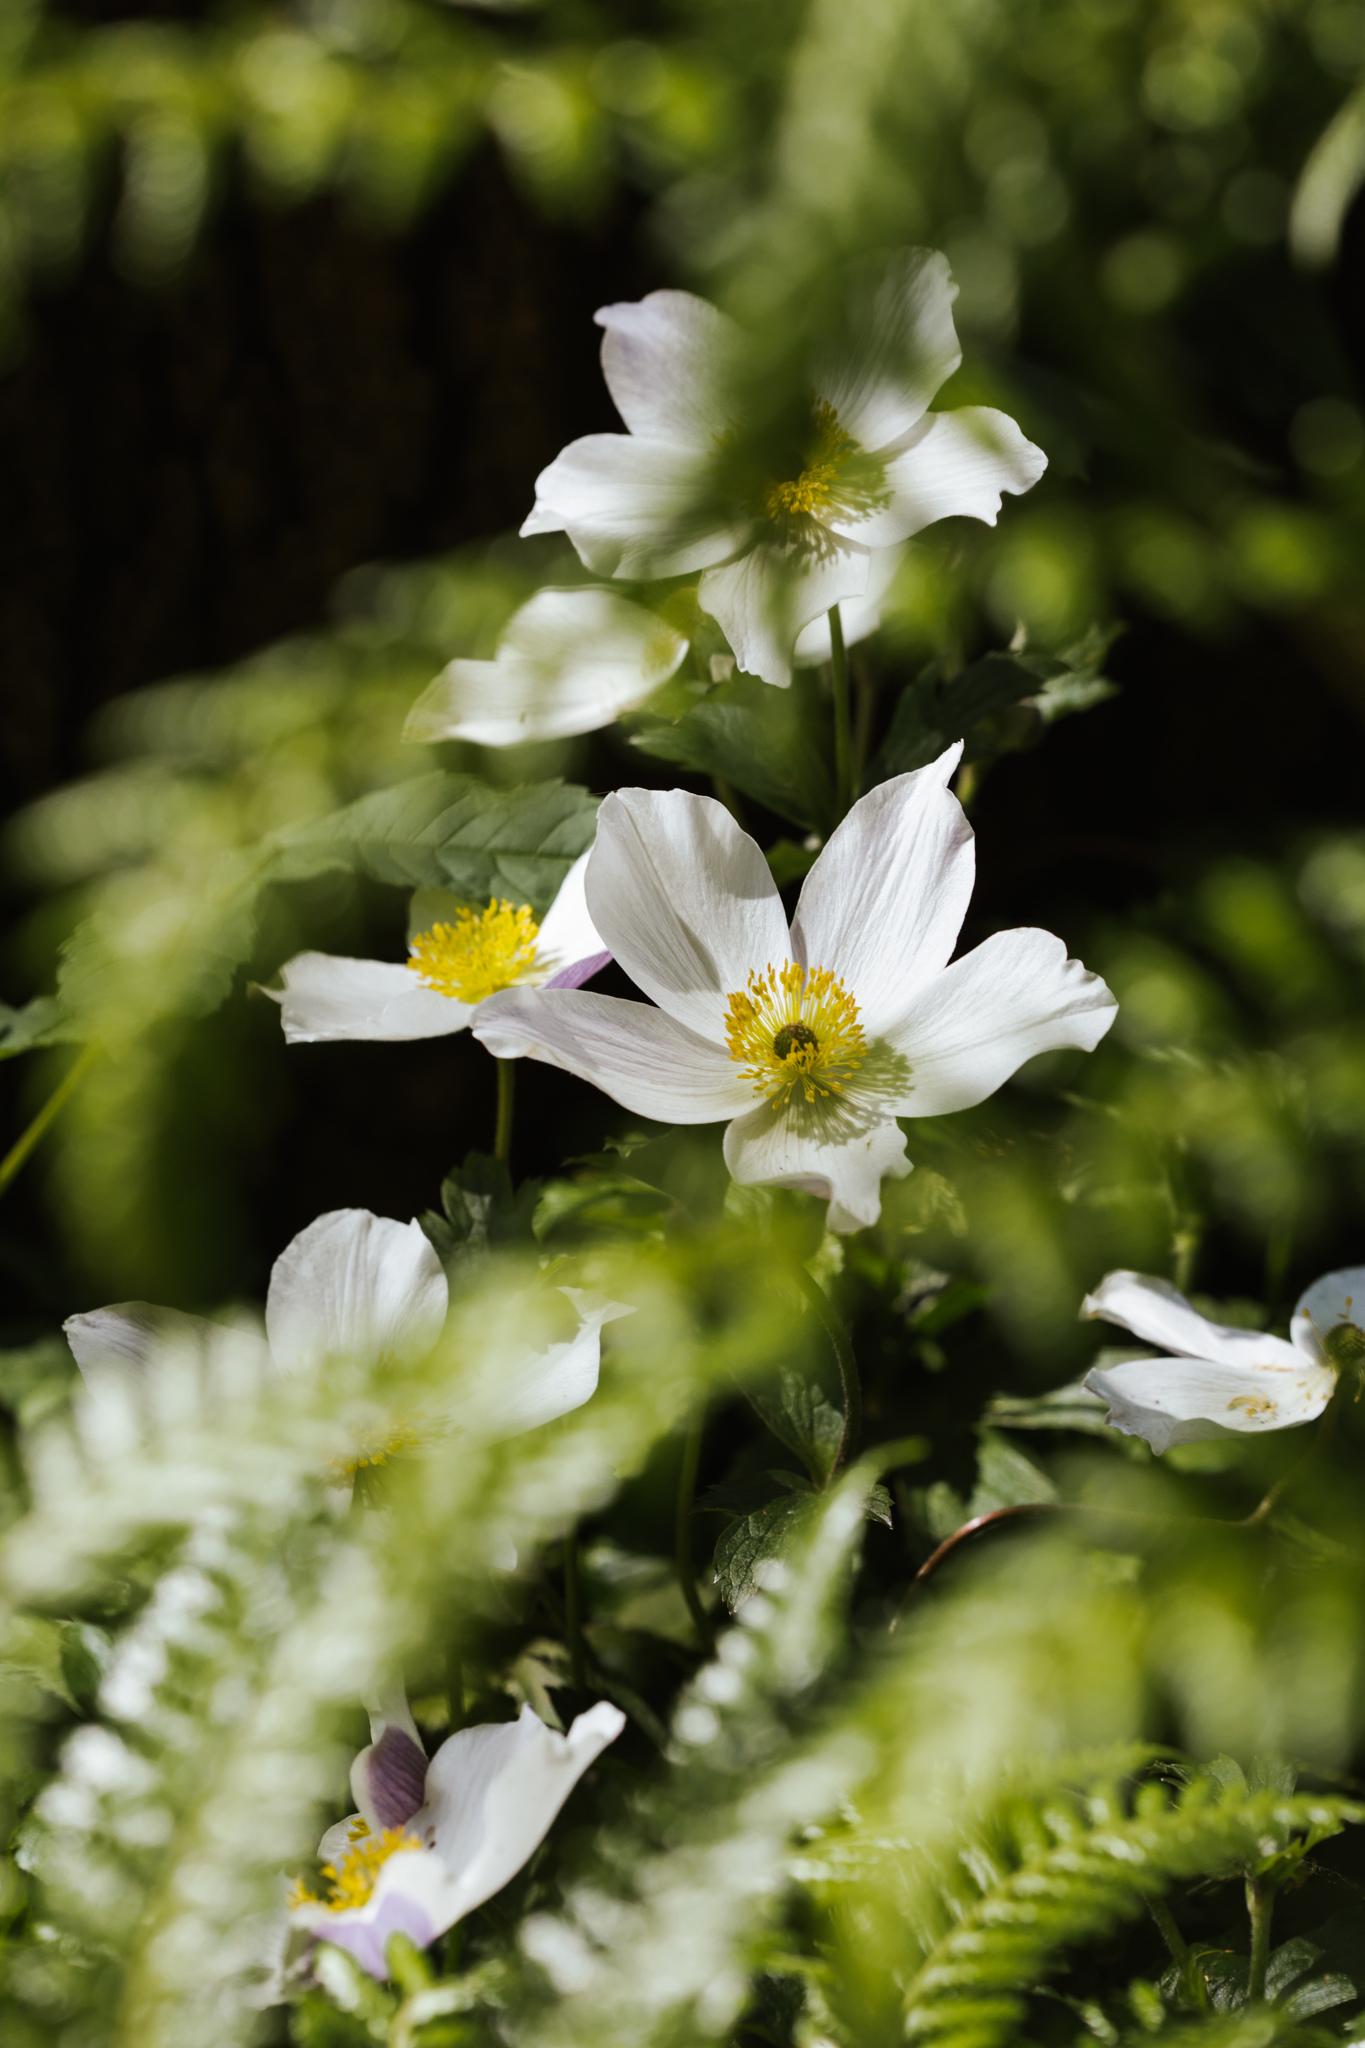 LAND-Chelsea-flower-show_Joanne-Crawford-8184.JPG